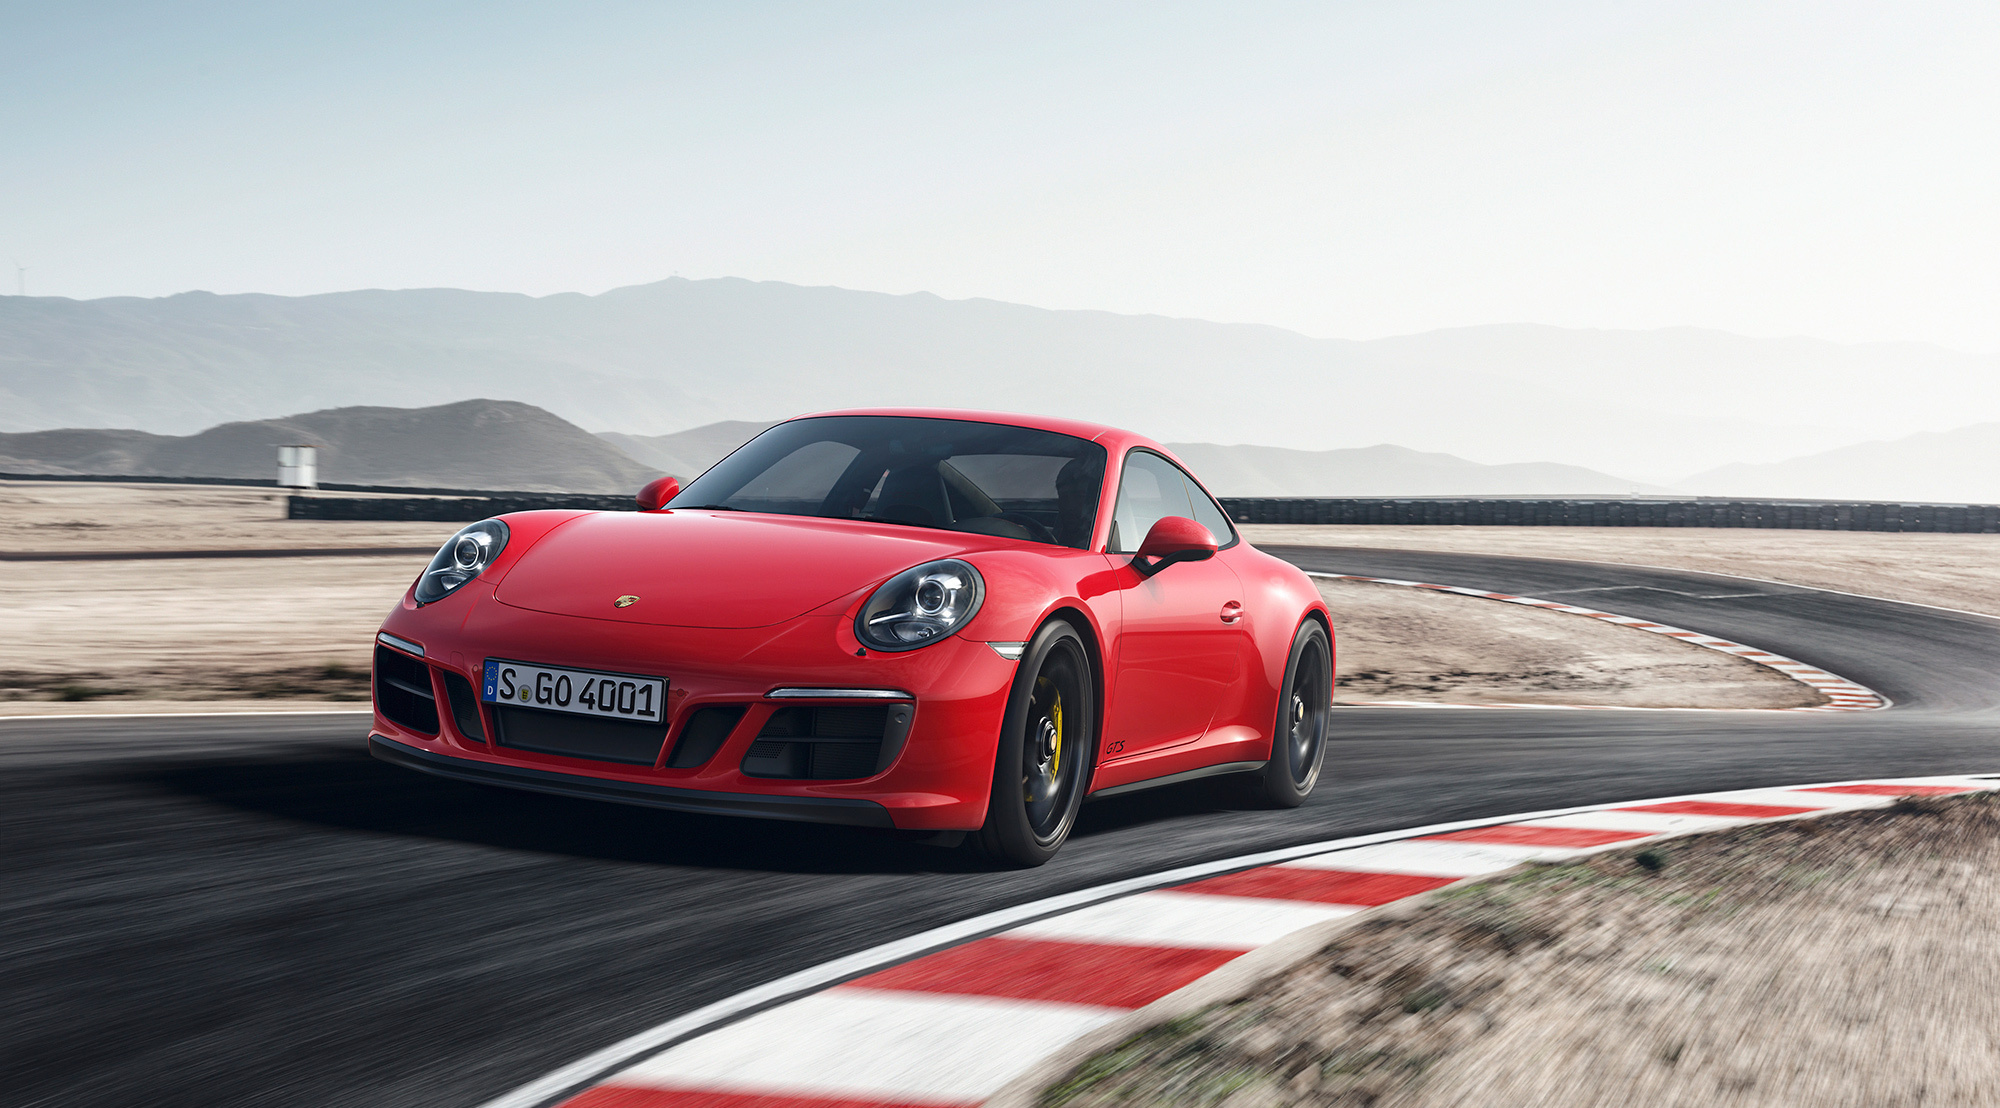 Porsche 911 Gts Cabriolet Wallpapers